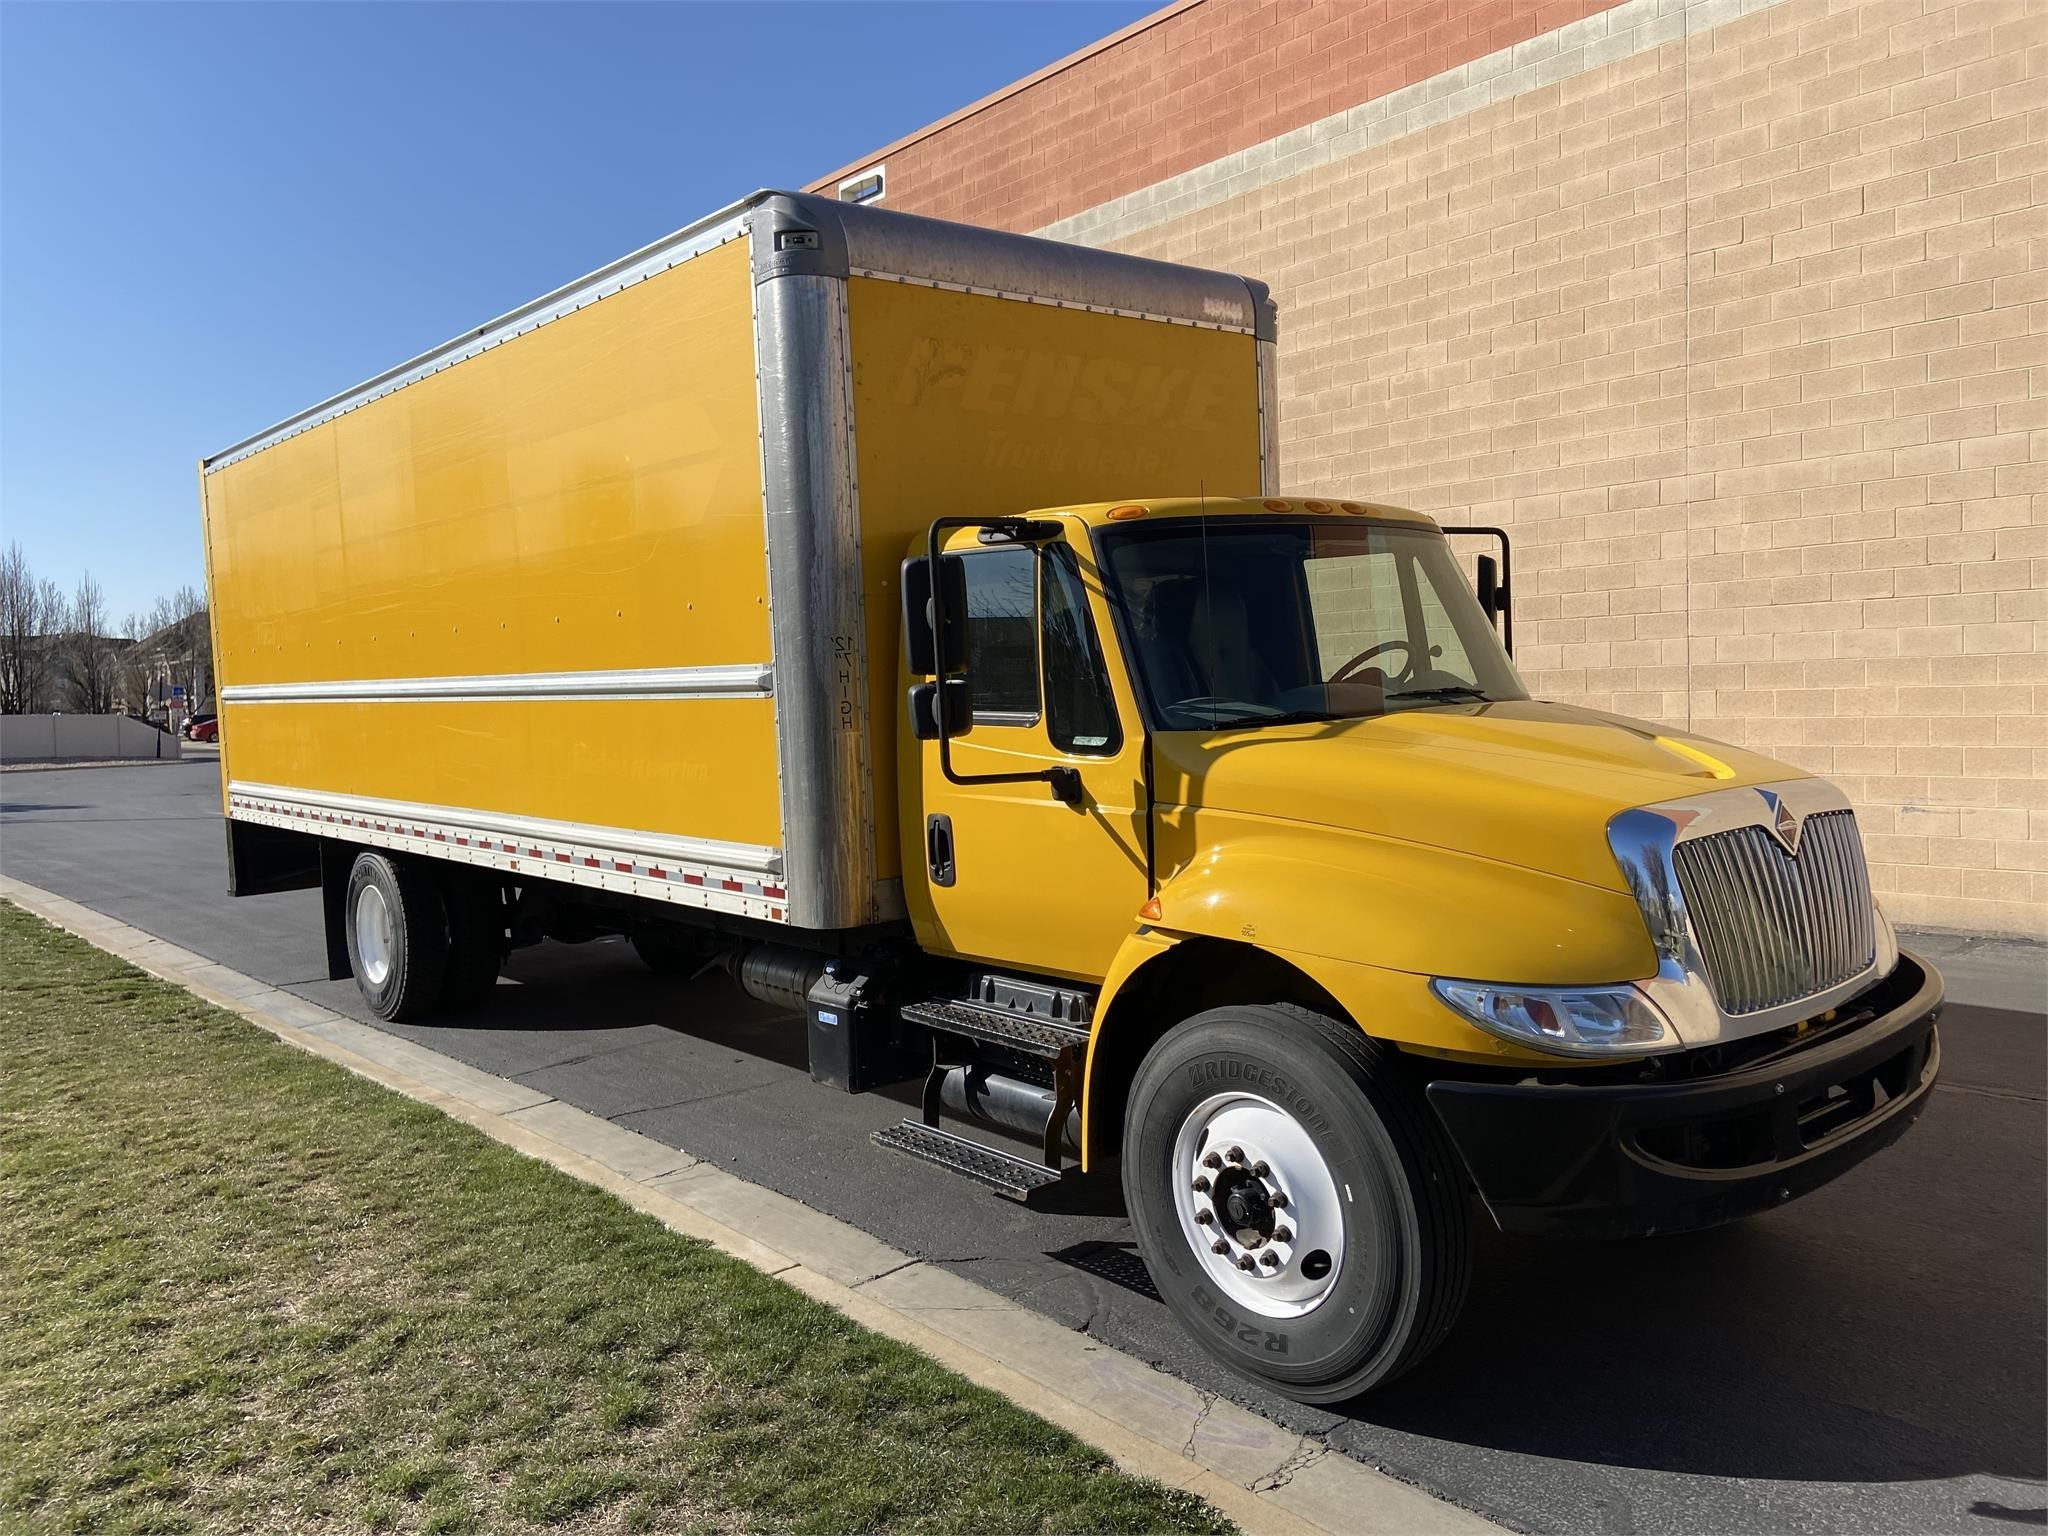 Used, 2017, INTERNATIONAL, 4000, Box Truck - Straight Truck